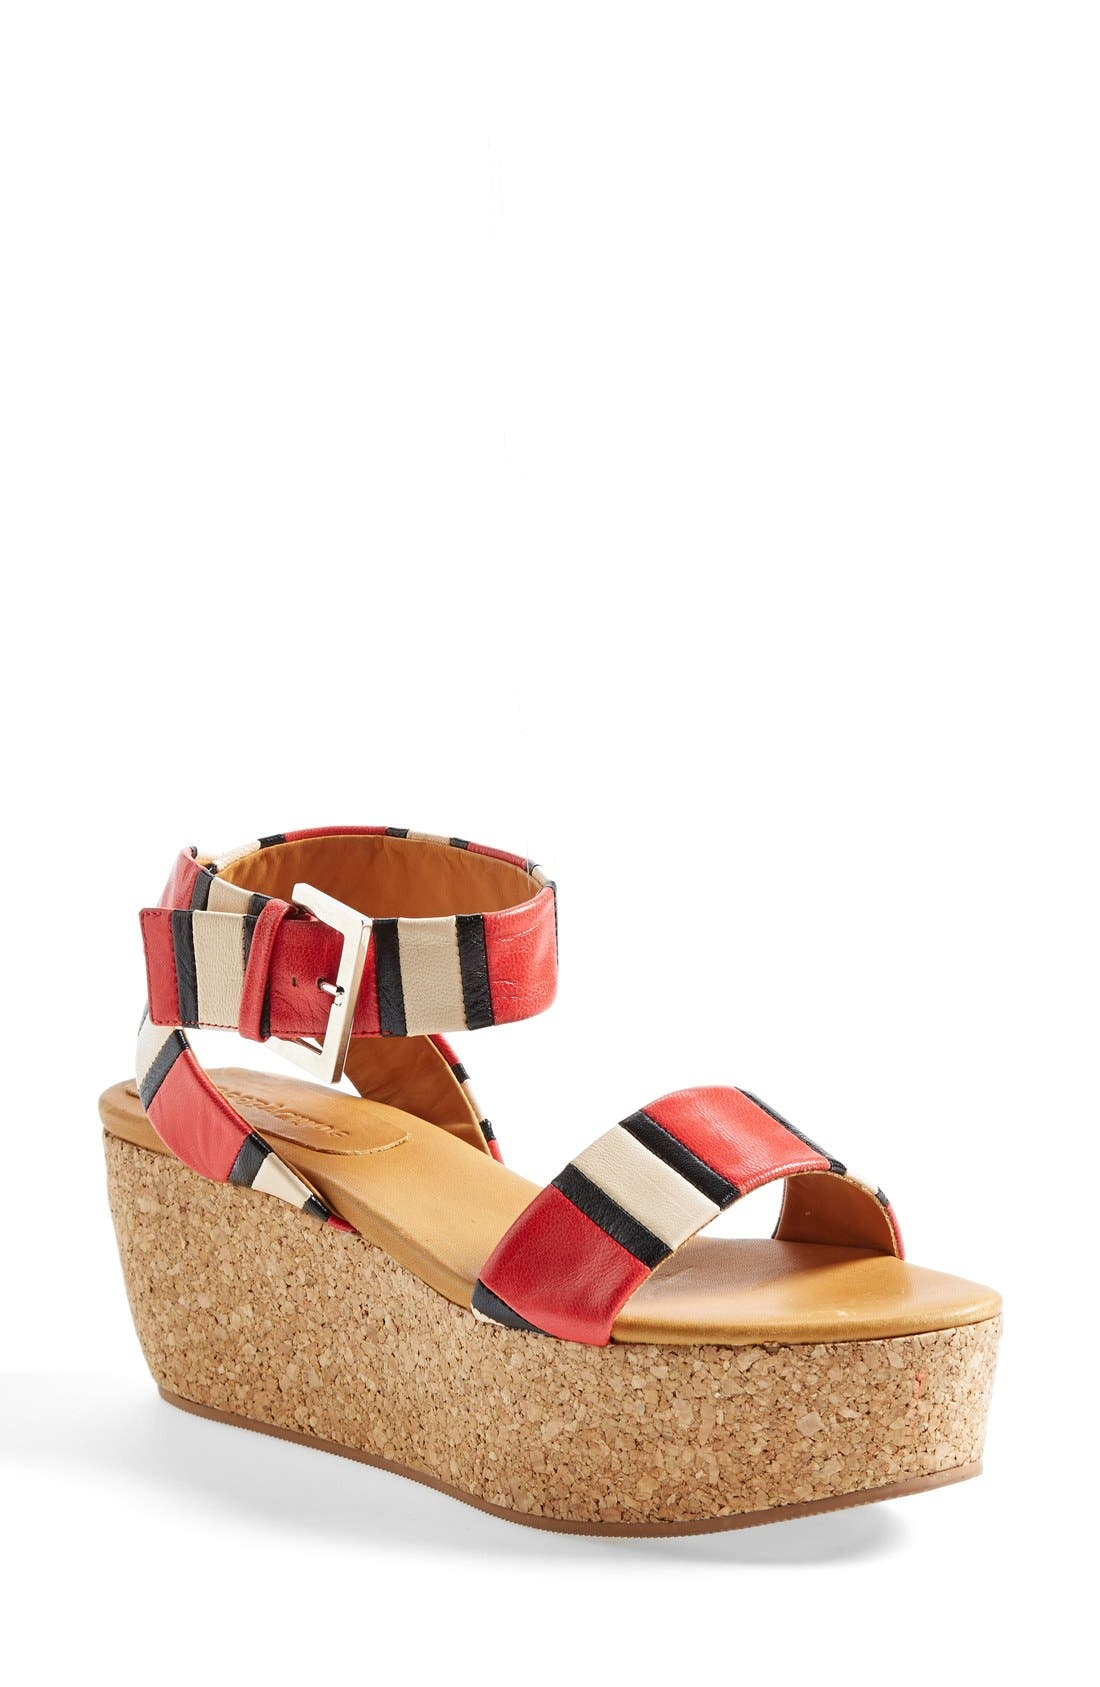 Main Image - See by Chloé 'Patti' Stripe Wedge Sandal